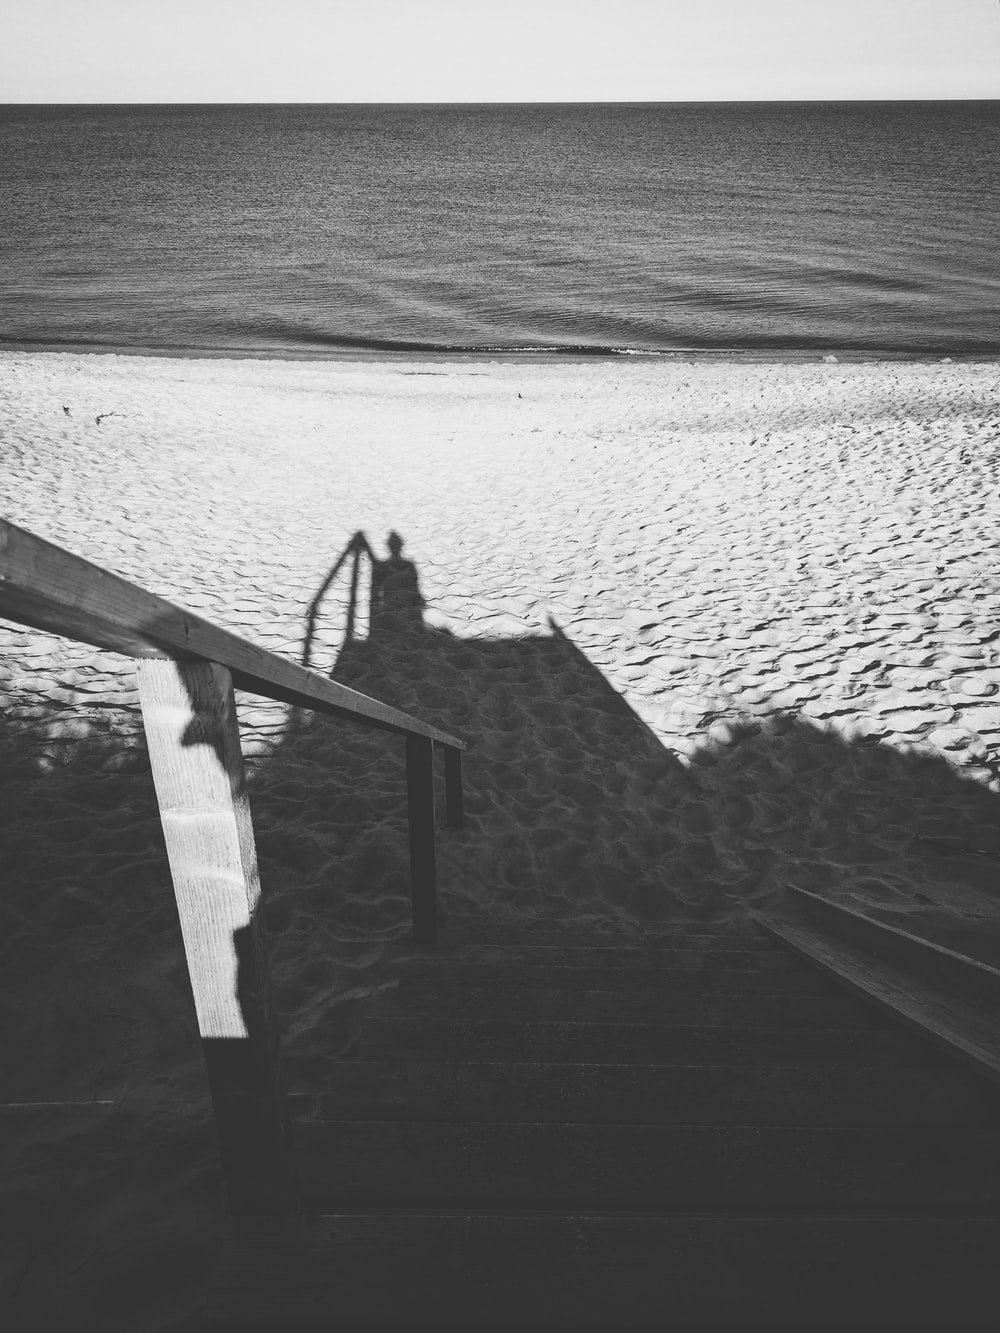 shadow of man near handrail on sand